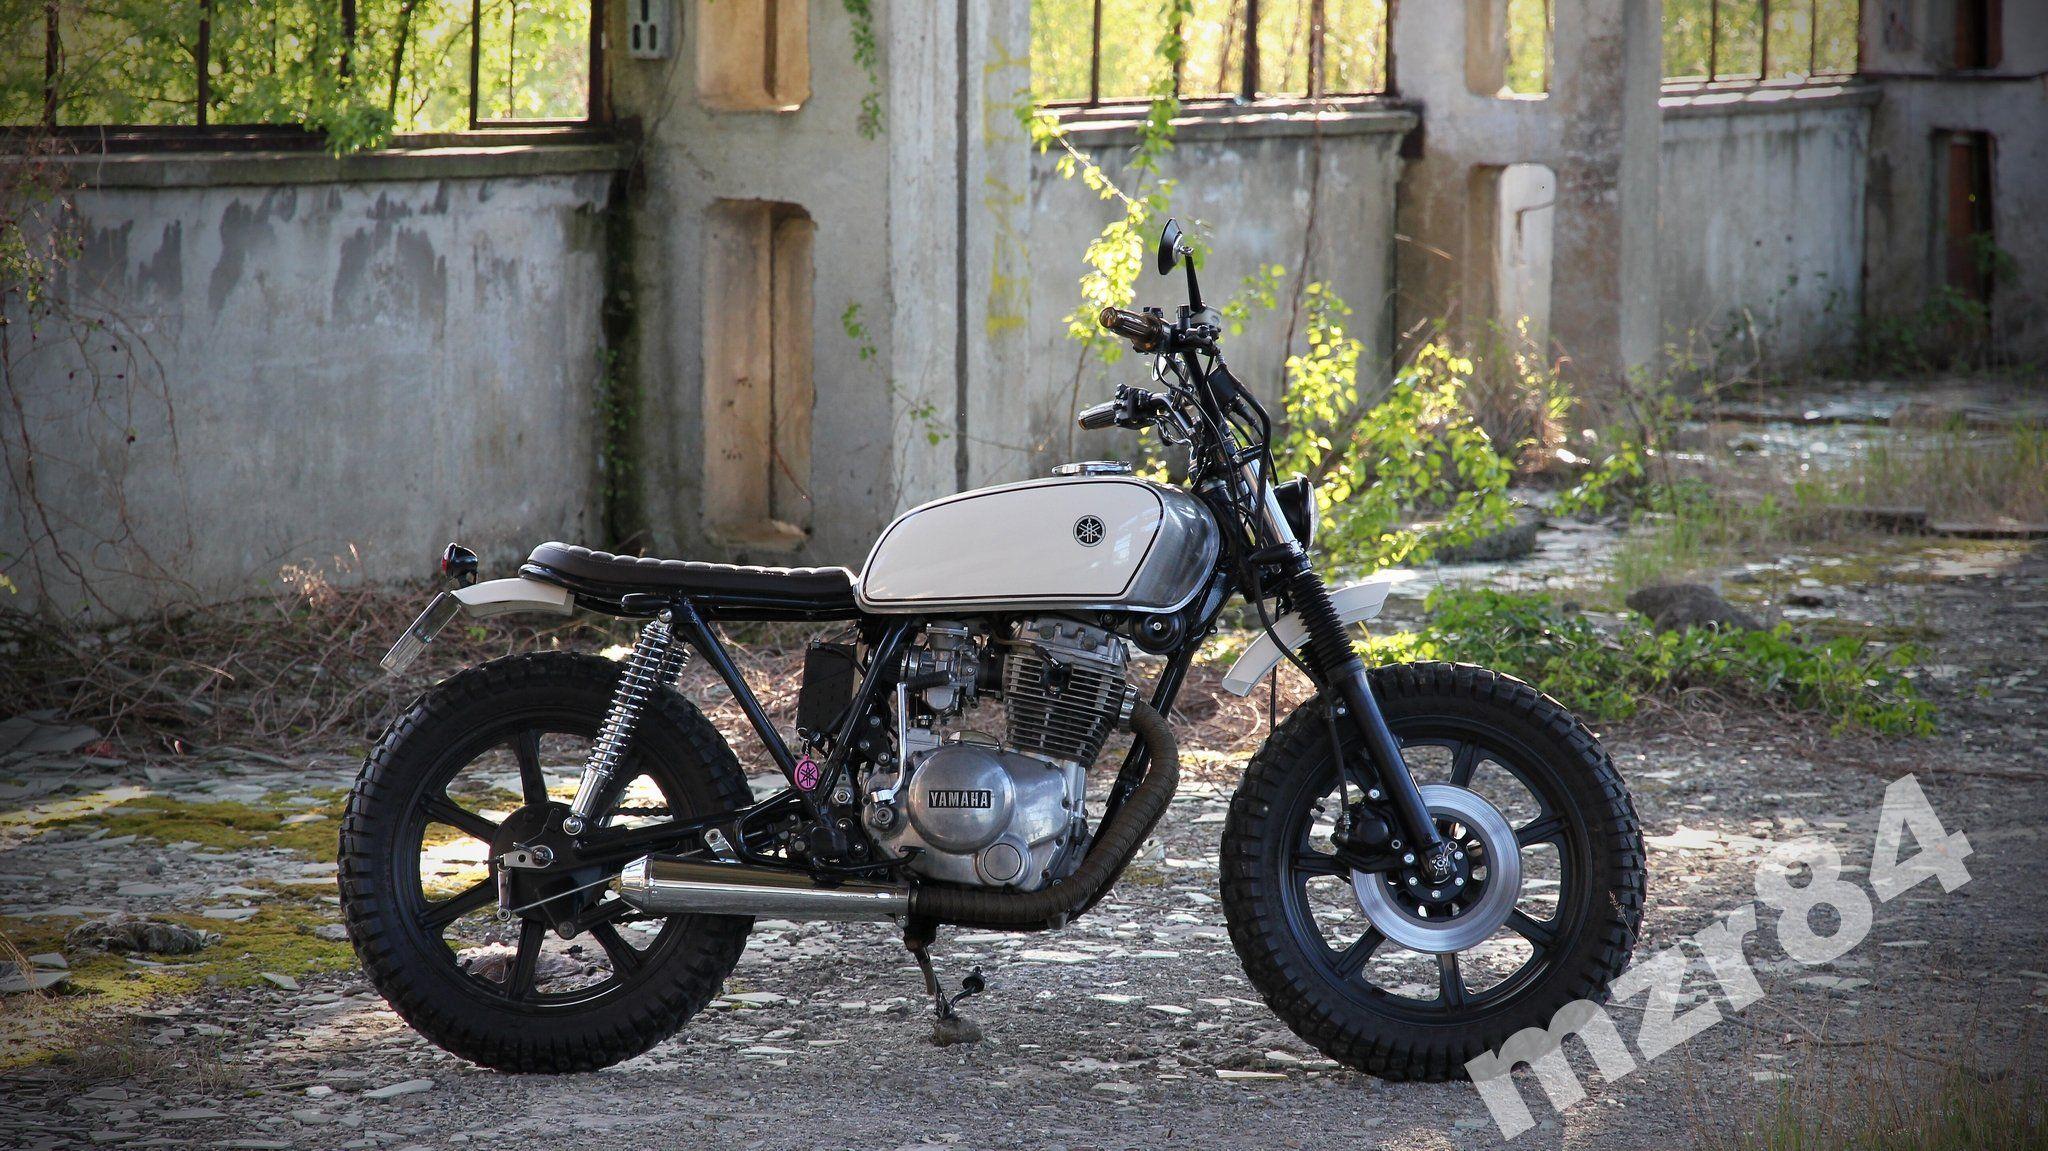 Yamaha Xs400 Scrambler Brat Cafe Racer Street 6424652001 Oficjalne Archiwum Allegro Moped Motorrad